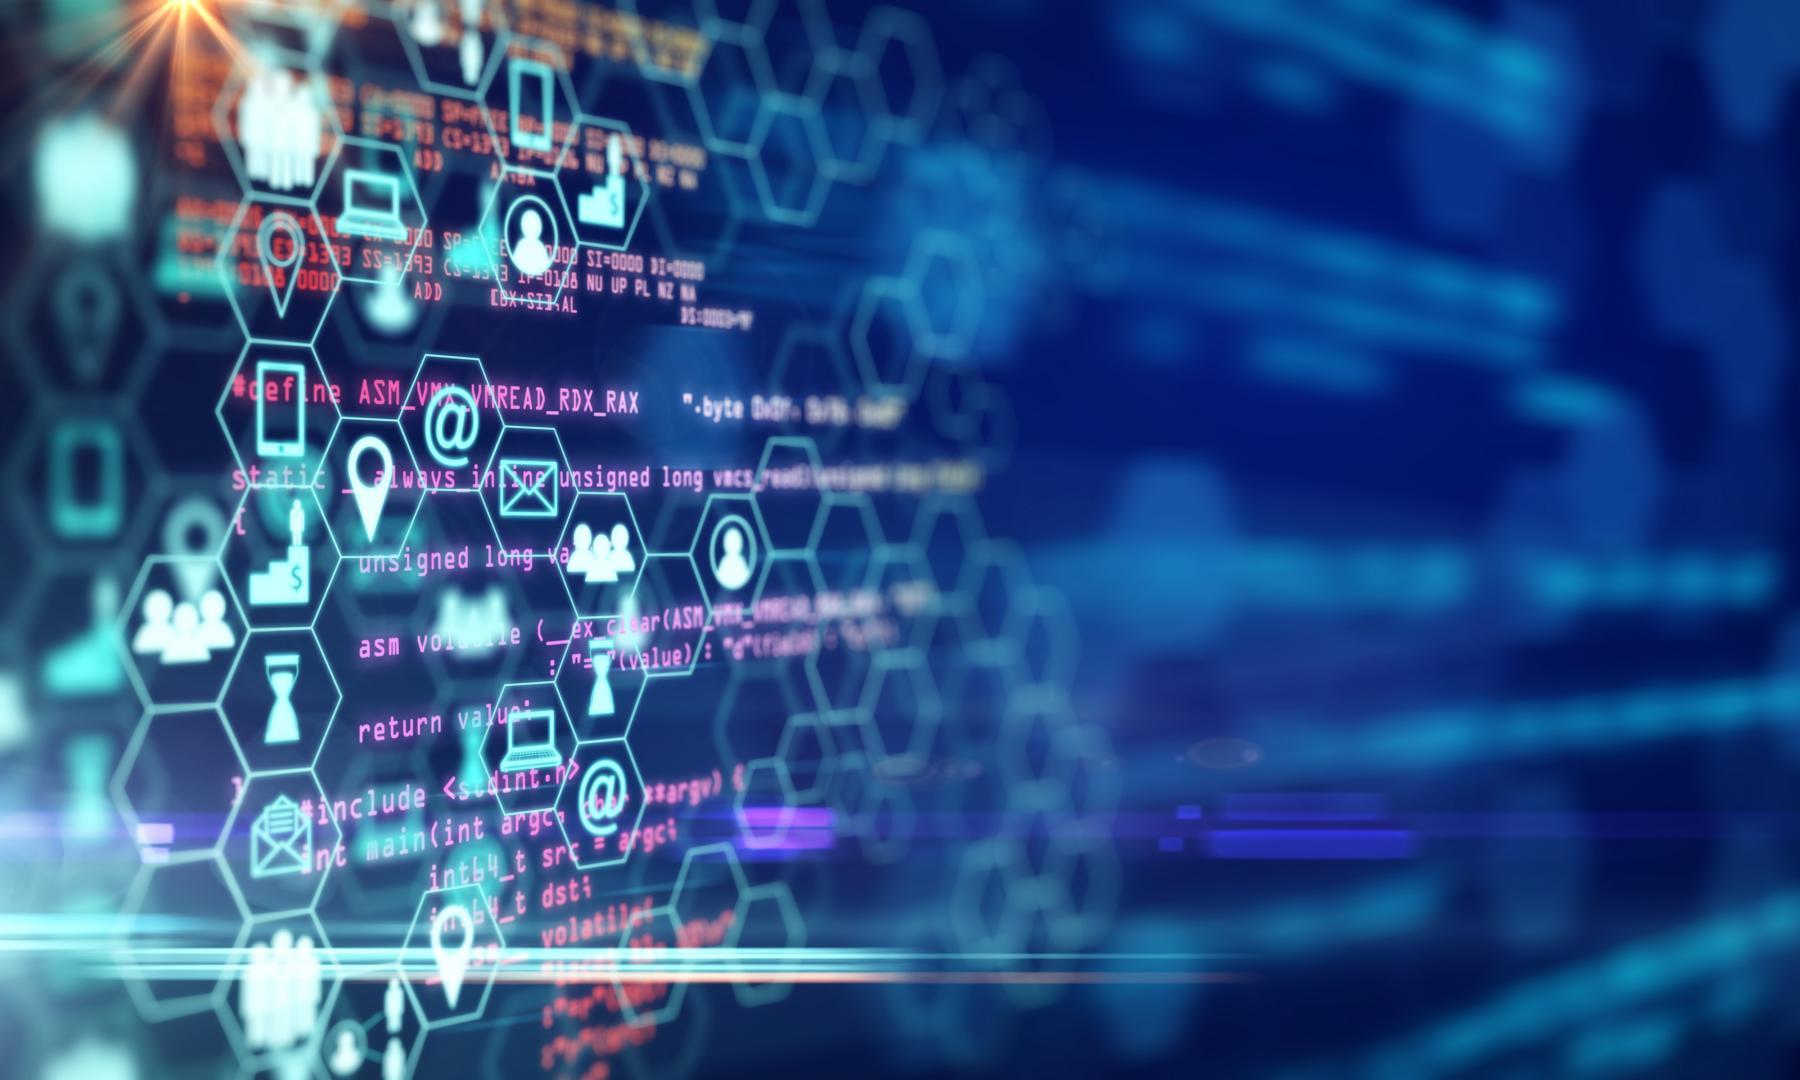 dijital-platform-theadx-secimler-icin-yapay-zeka-teknolojisi